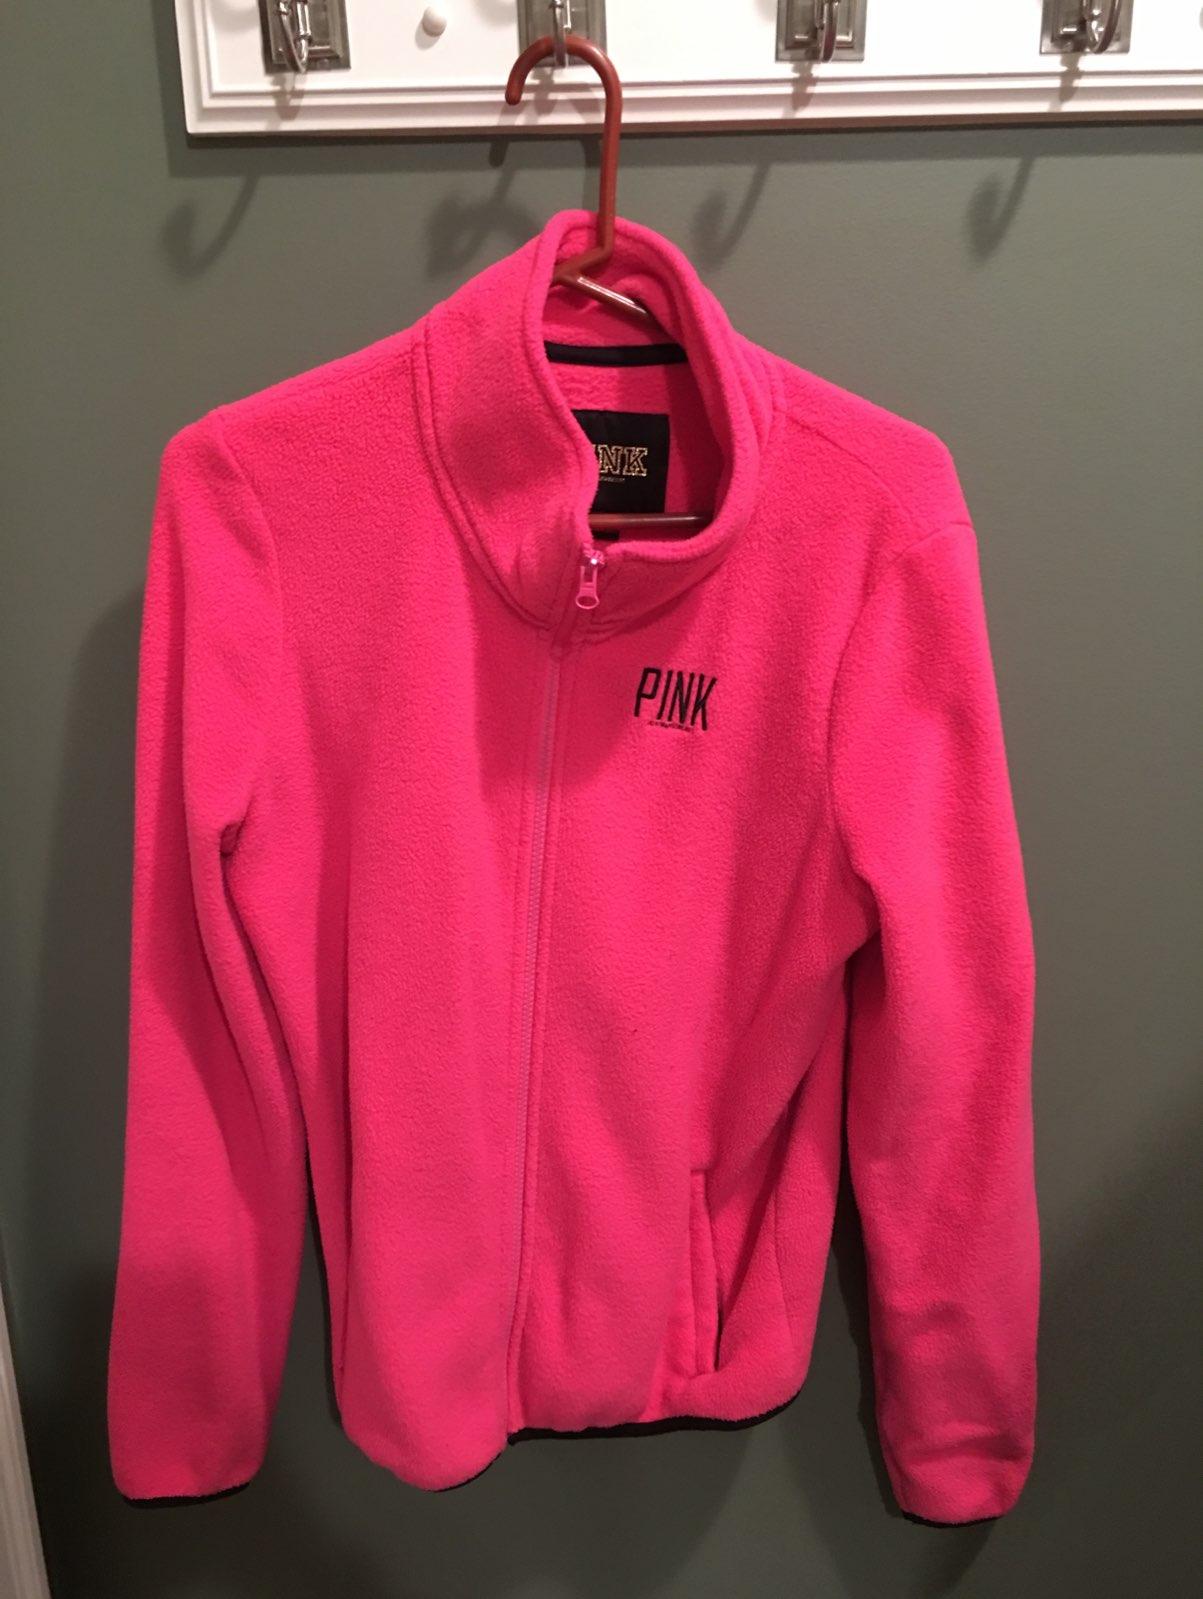 Victoria's Secret Pink Fleece Jacket - Mercari: BUY & SELL THINGS ...